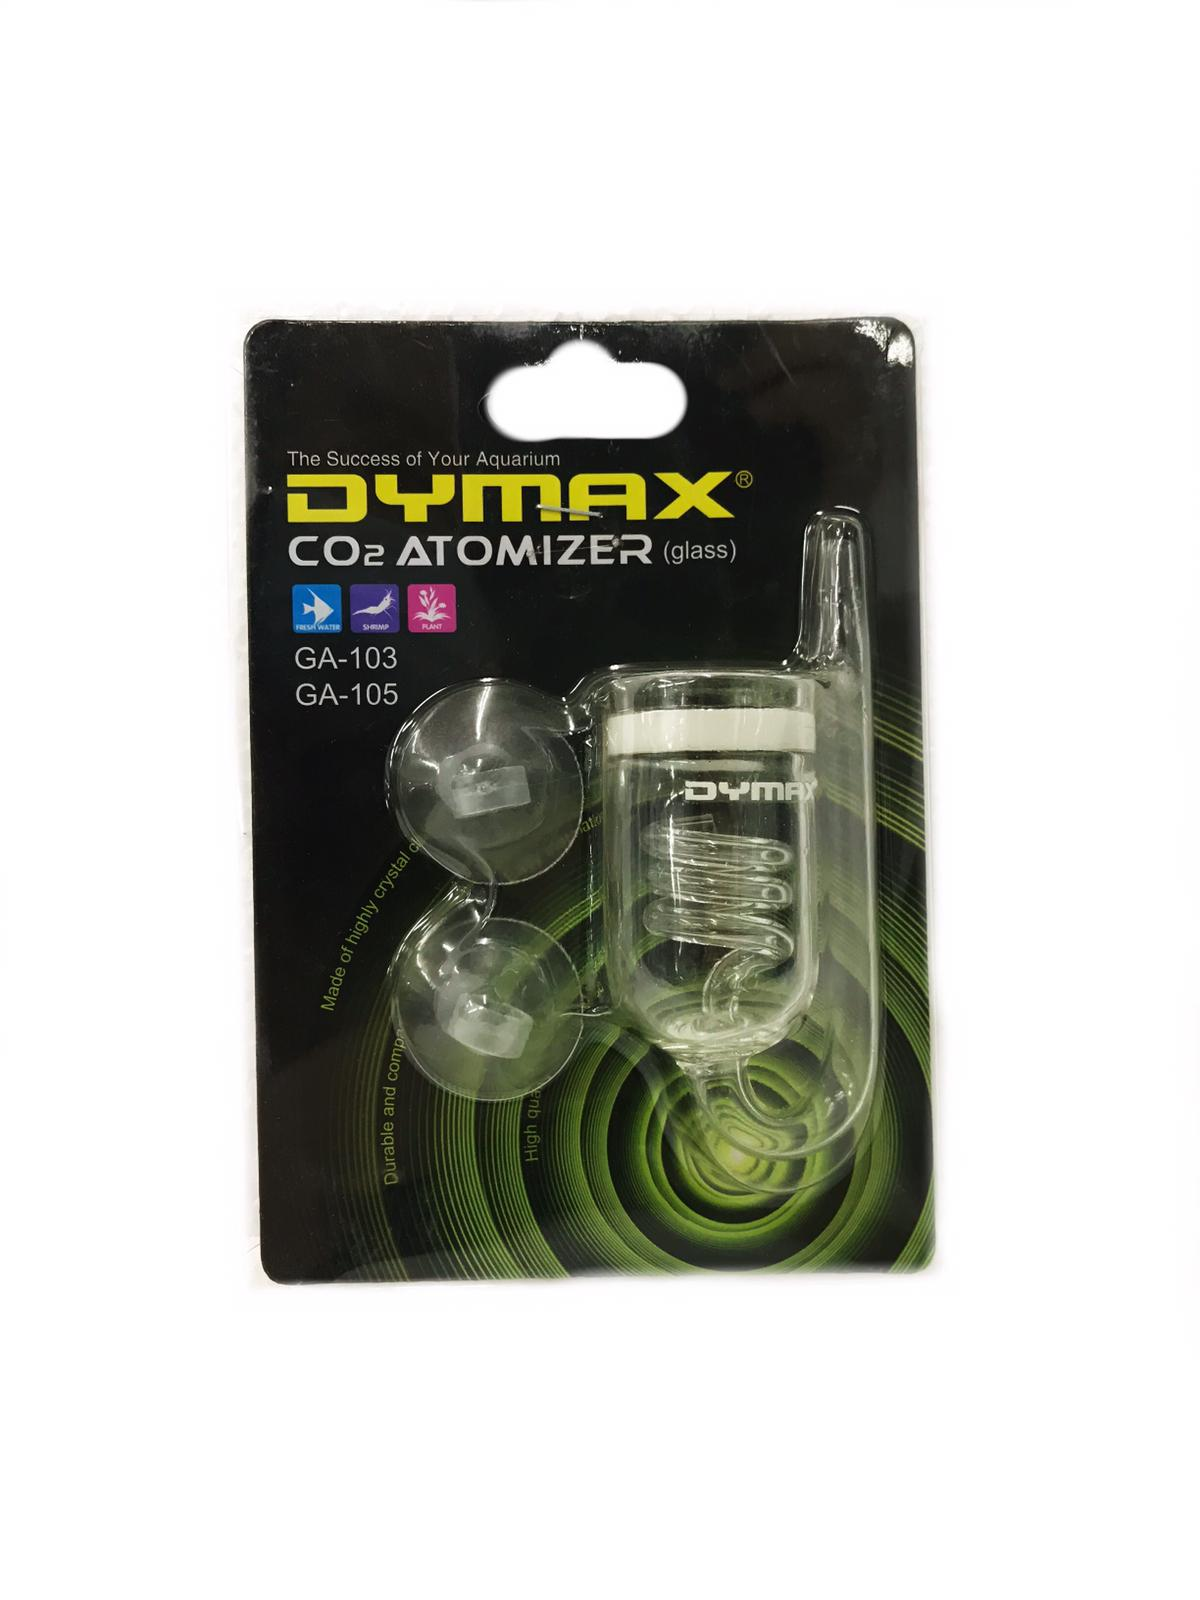 Dymax Co2 Atomizer (Glass)